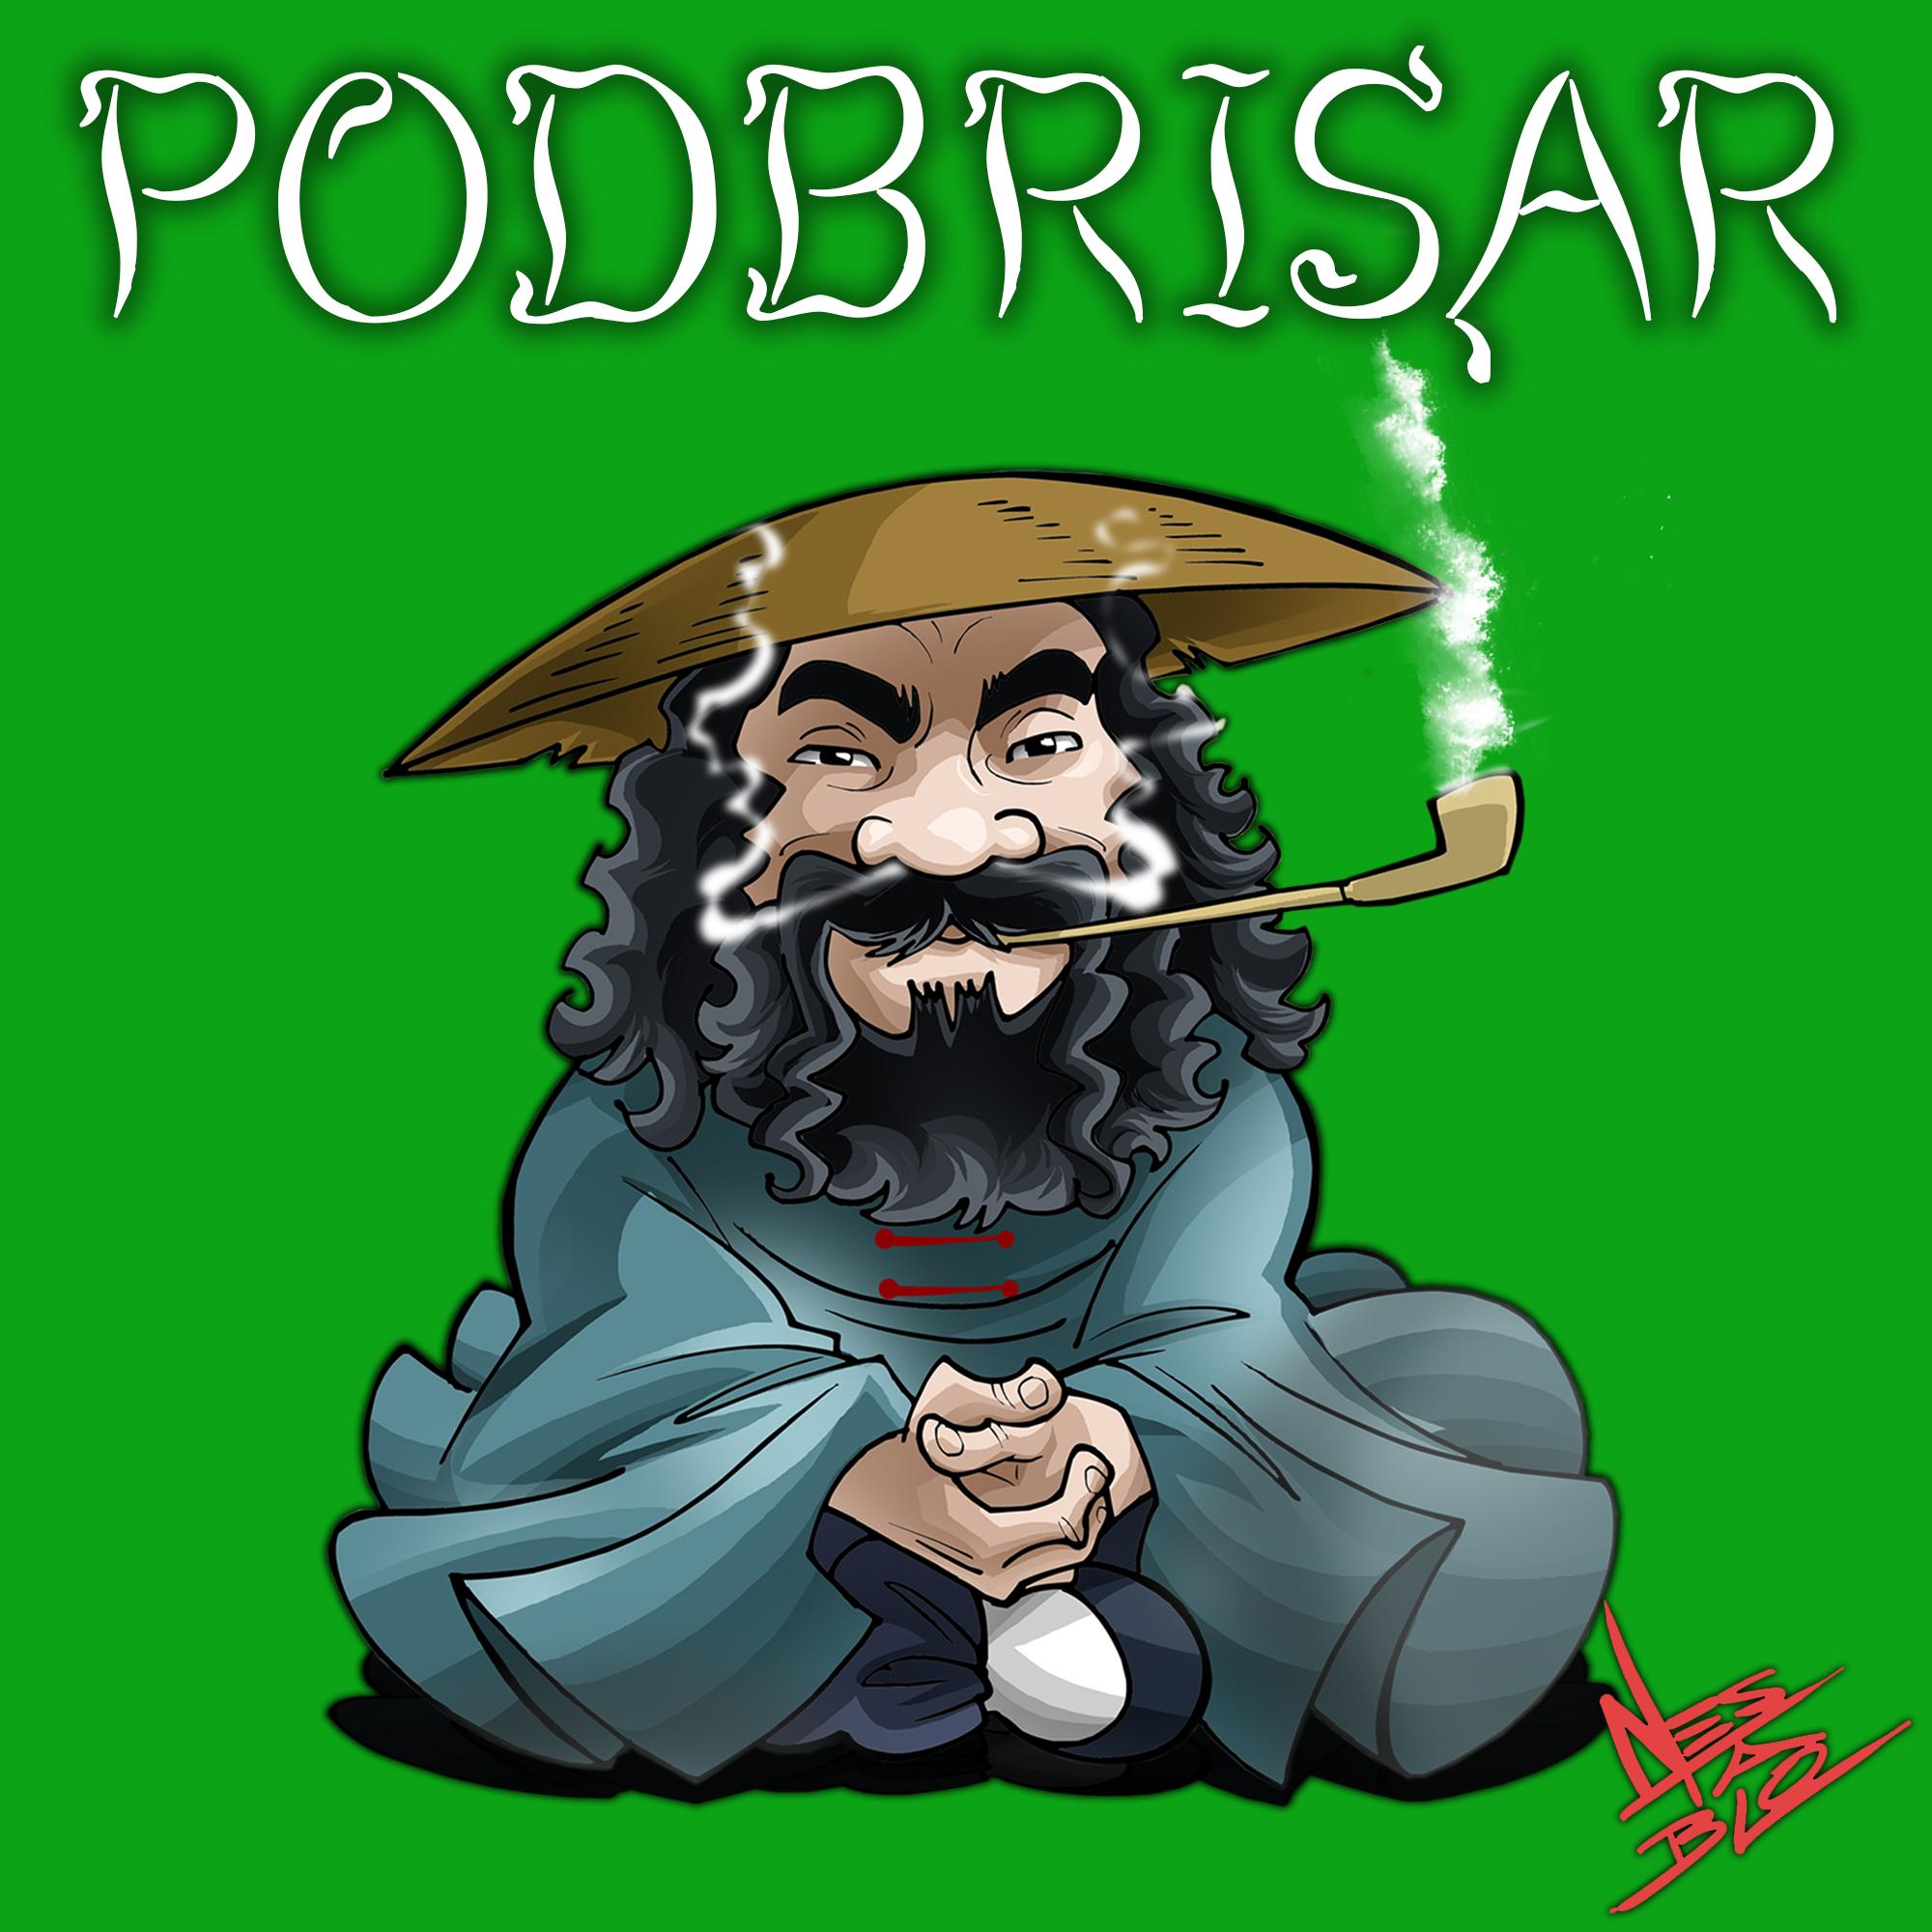 PodBrisar